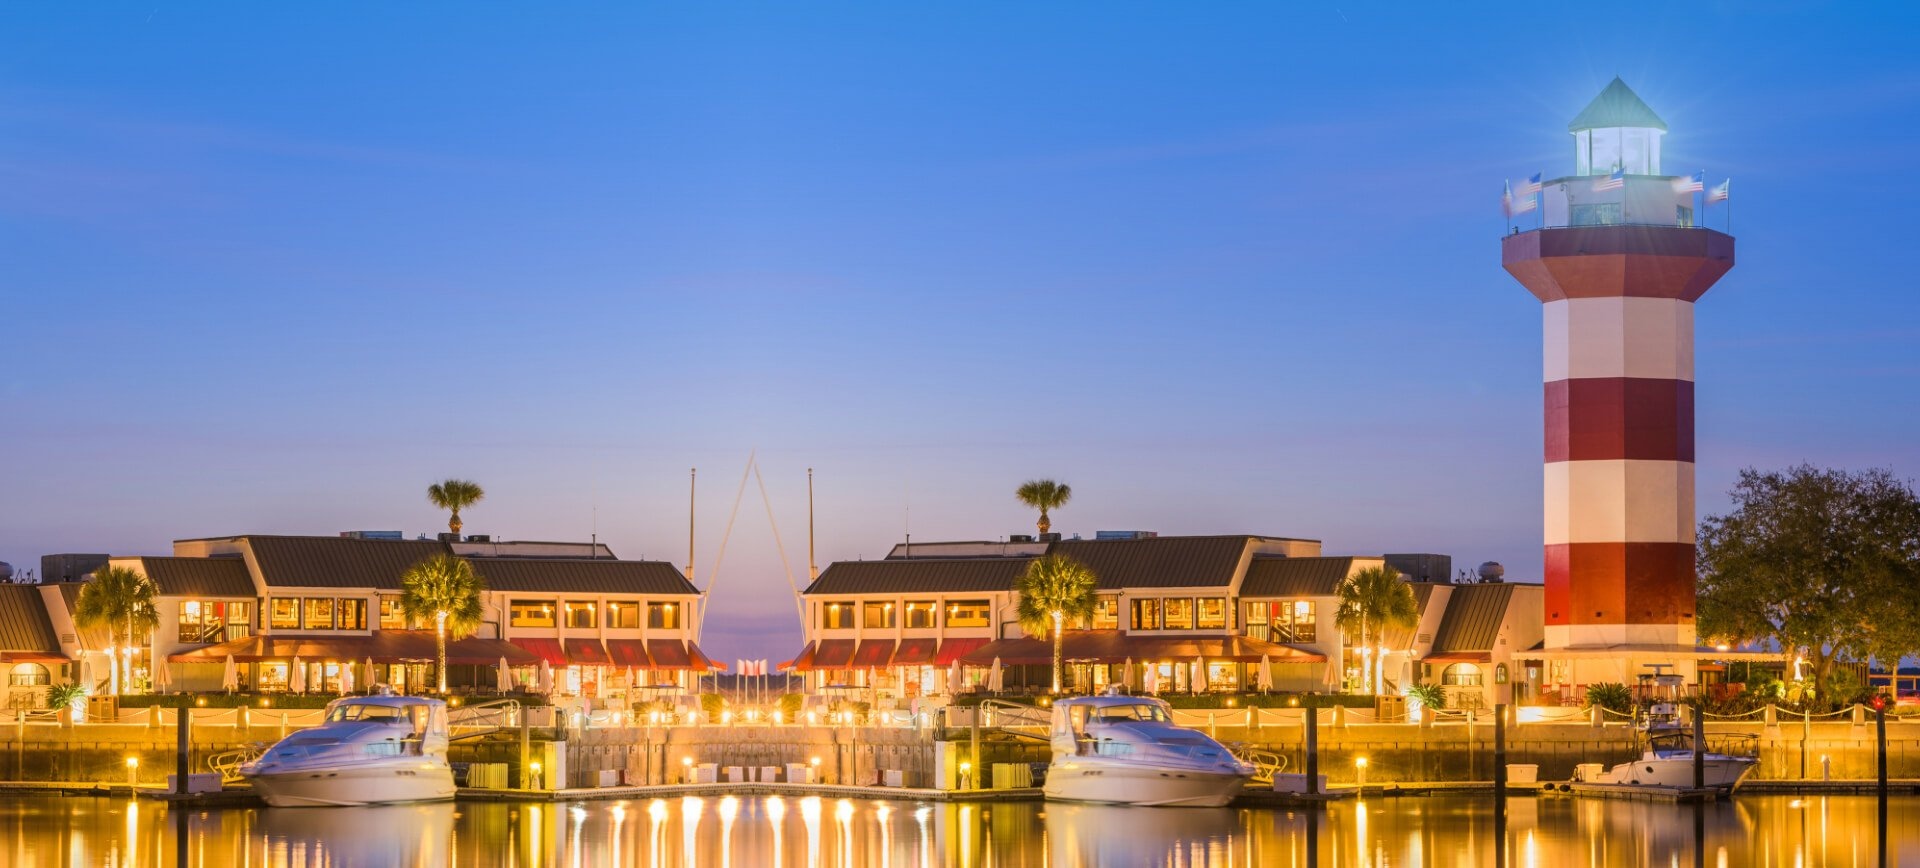 https://getaways.vacationvip.com/fb-promotions/4-3-hilton-head-sr-hotel/img/generic-info-bg.jpg